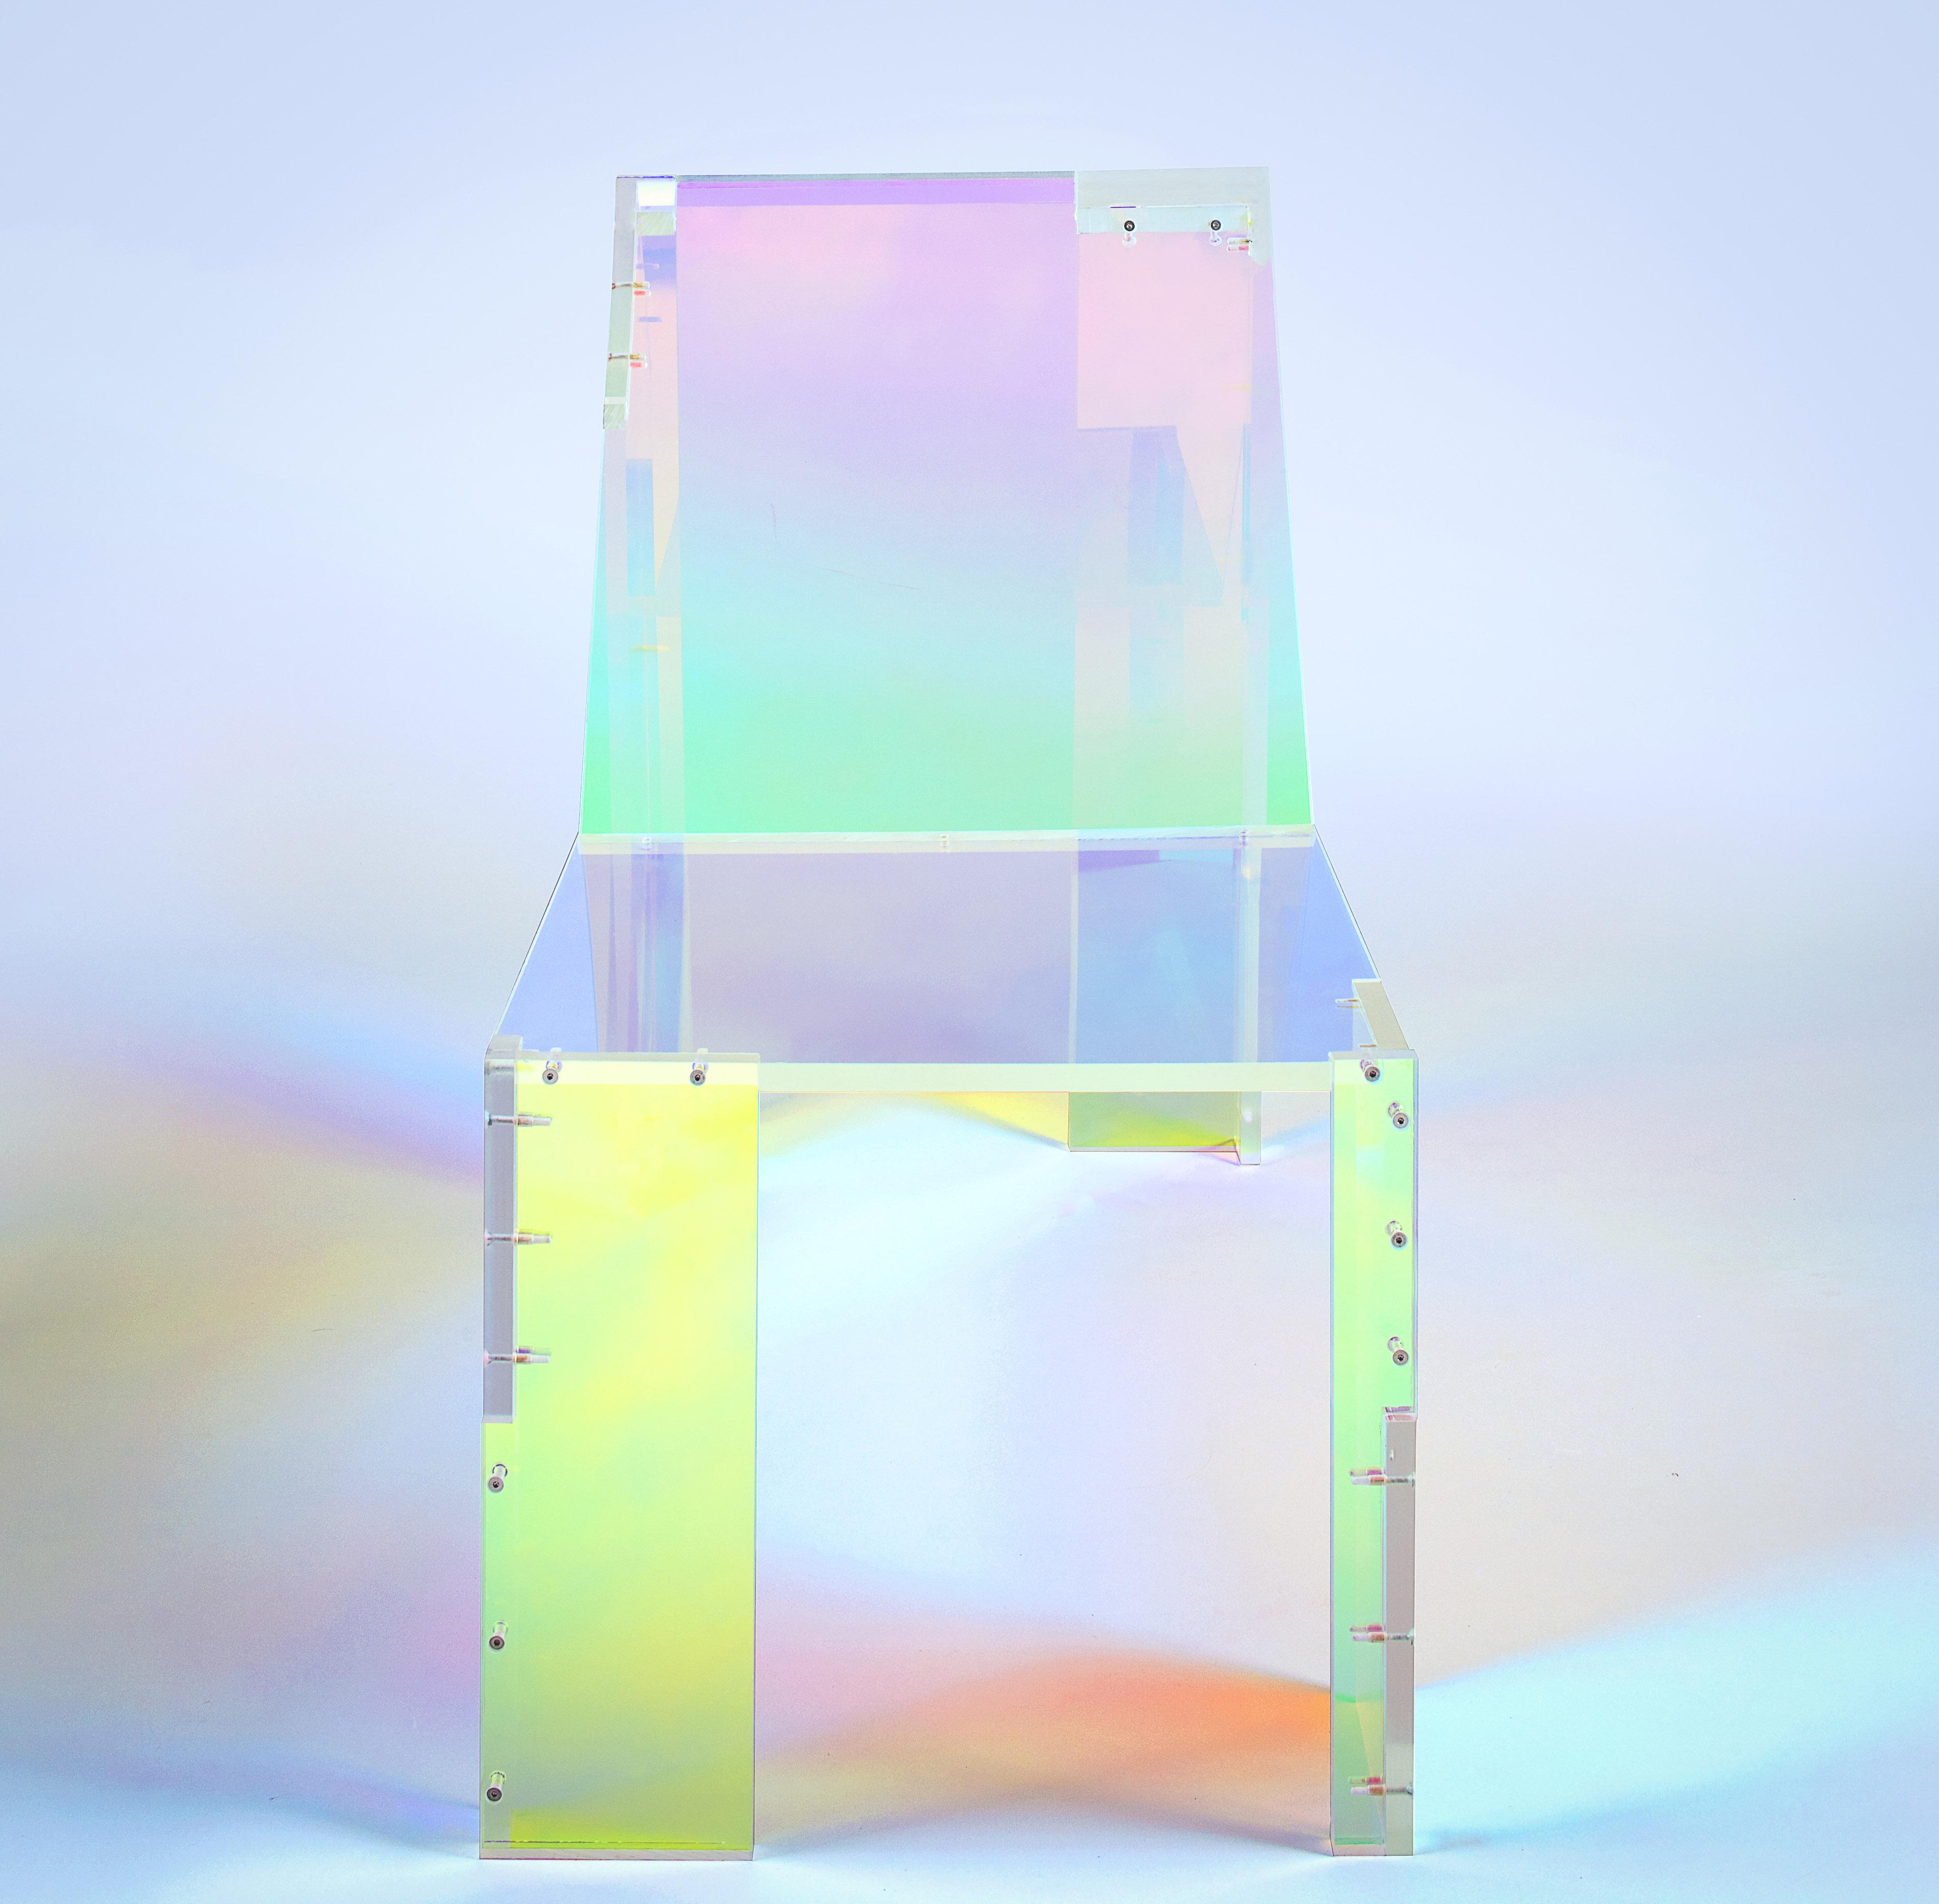 French Touch Chair by Juliette Mutzke-Felippelli for JOOGII